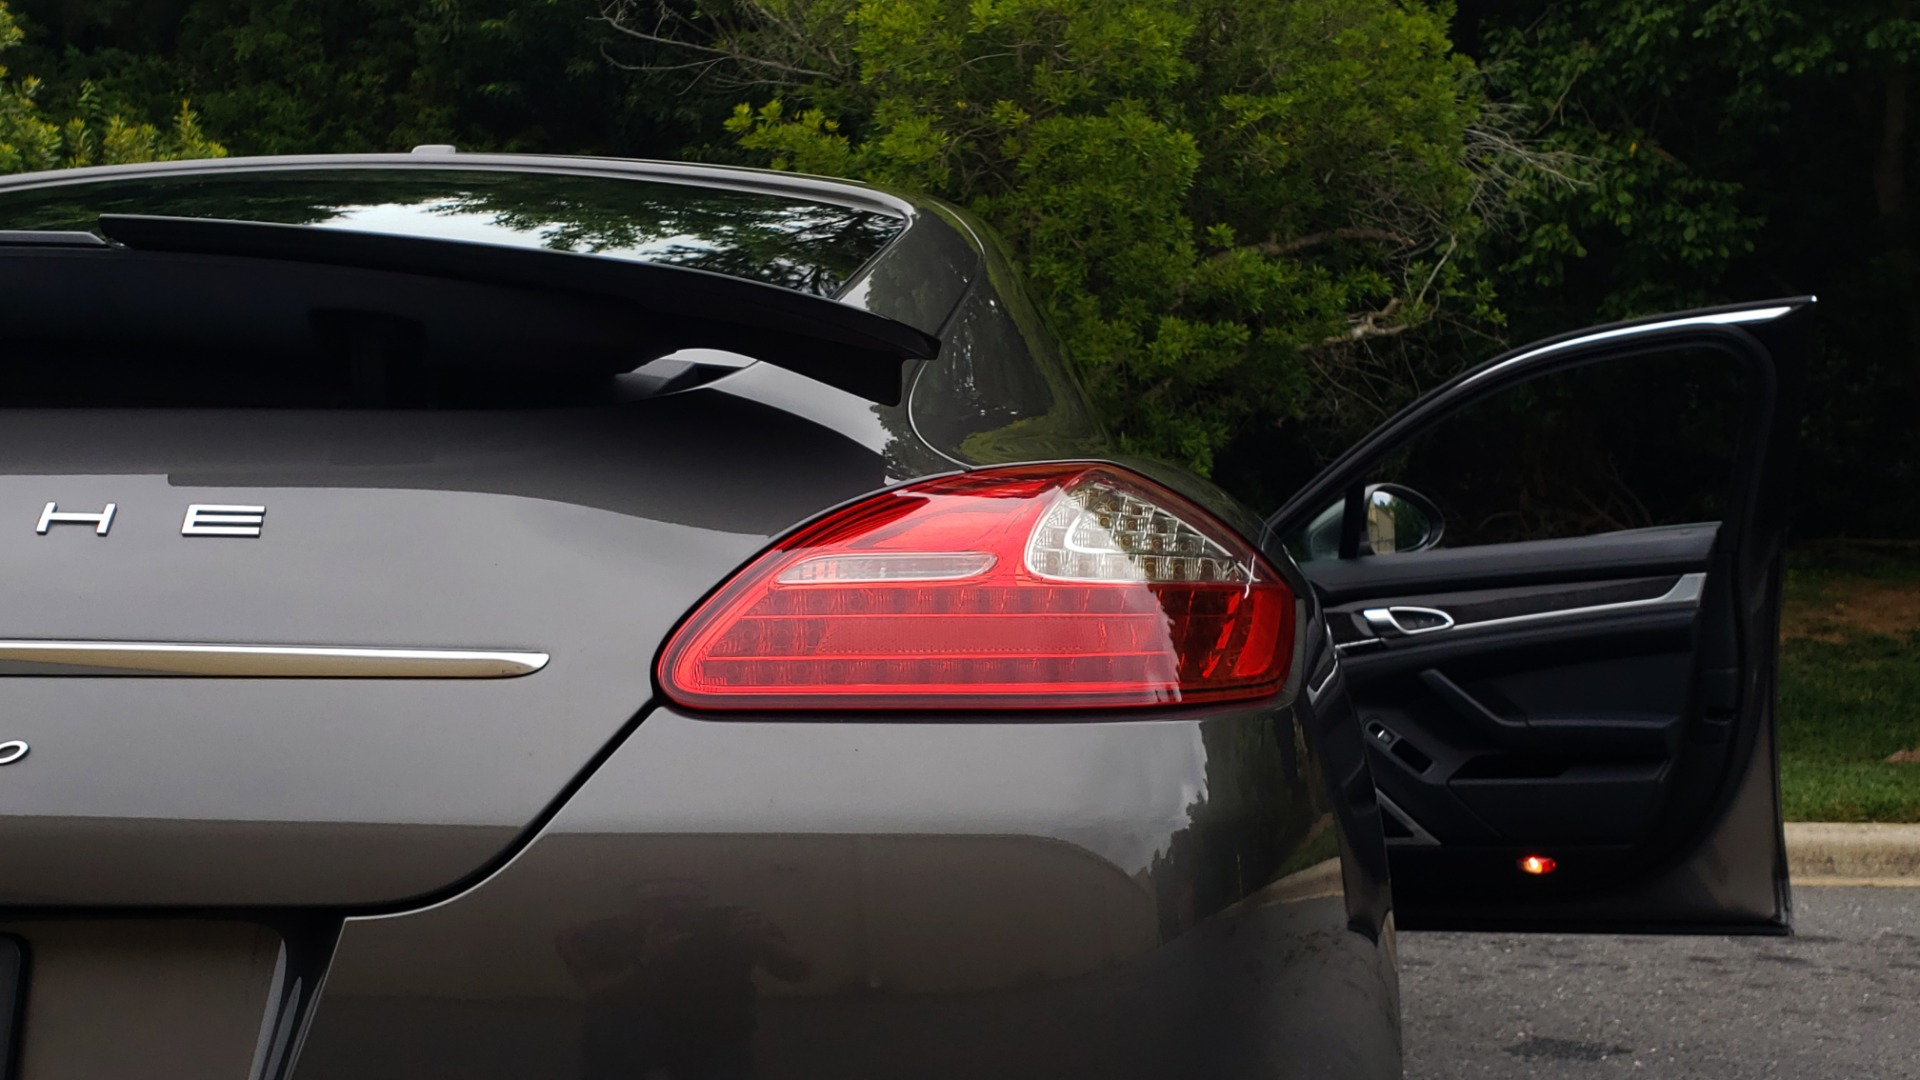 Used 2013 Porsche PANAMERA TURBO 4.8L V8 / AWD / NAV / SUNROOF / LCA / PARK ASST / BURMESTER for sale $45,995 at Formula Imports in Charlotte NC 28227 27